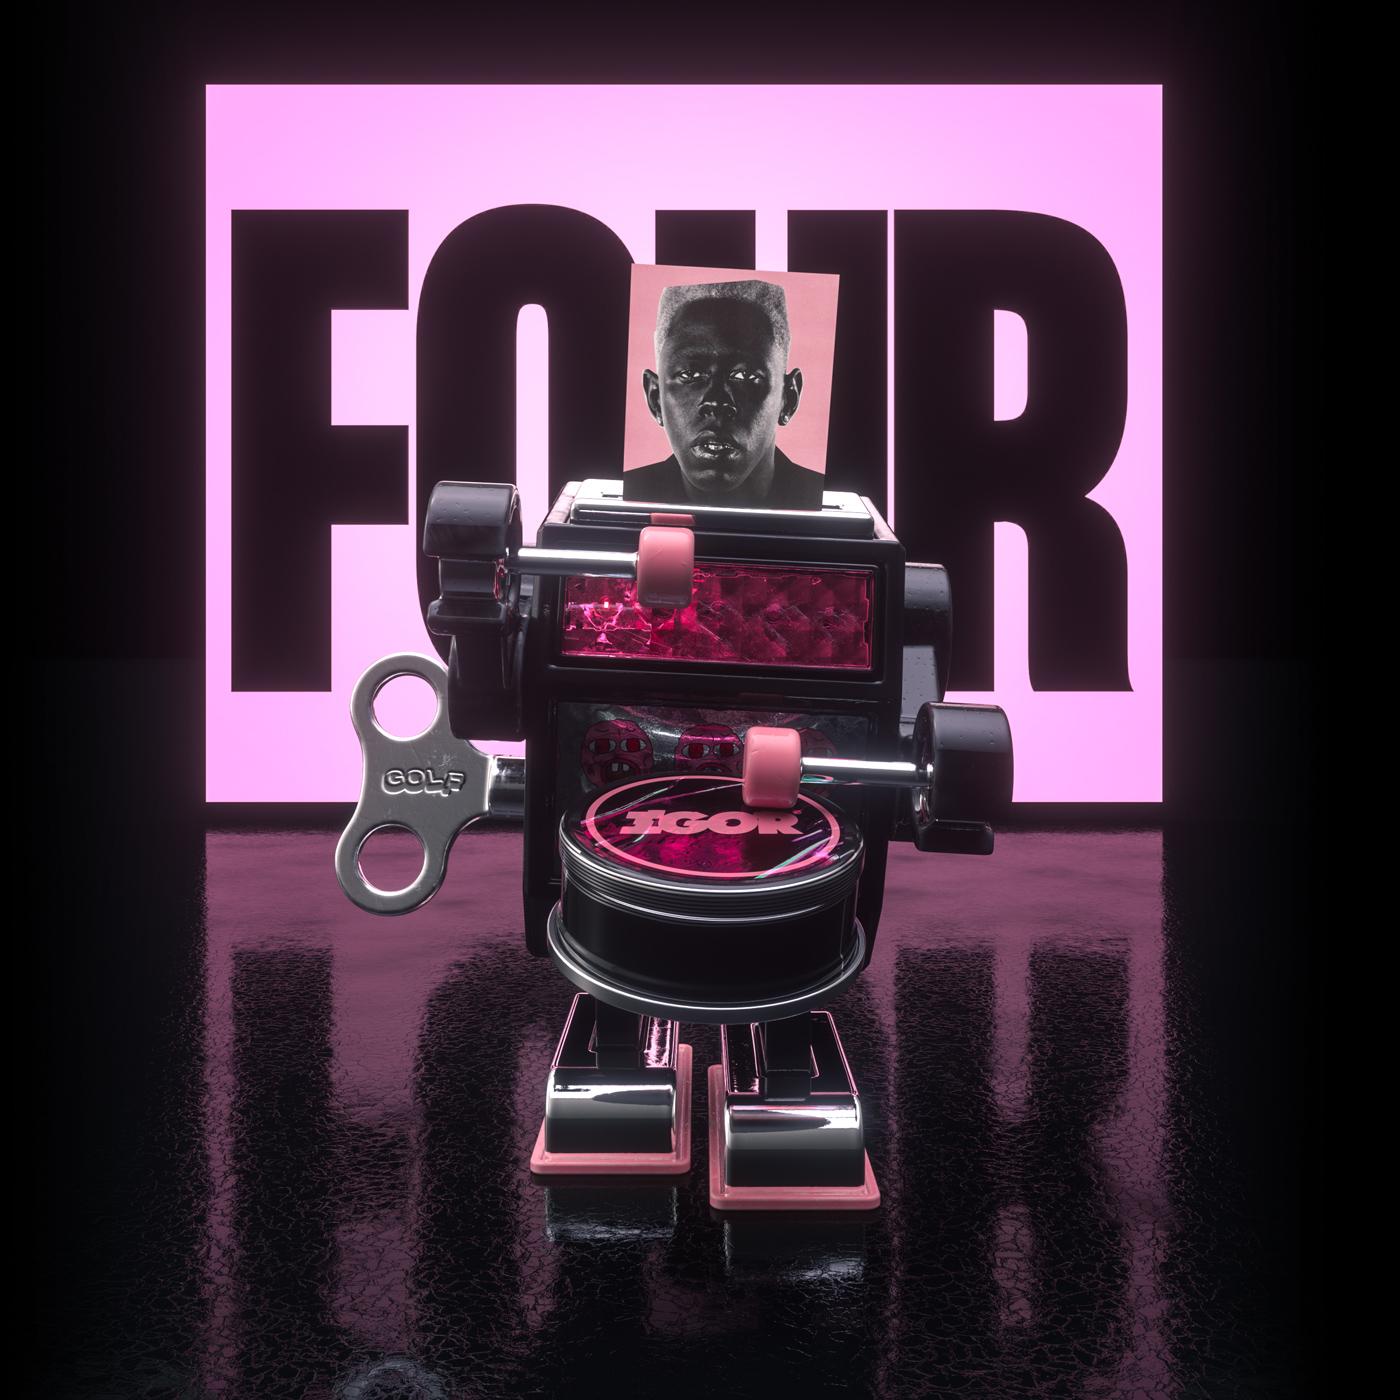 Tyler robot